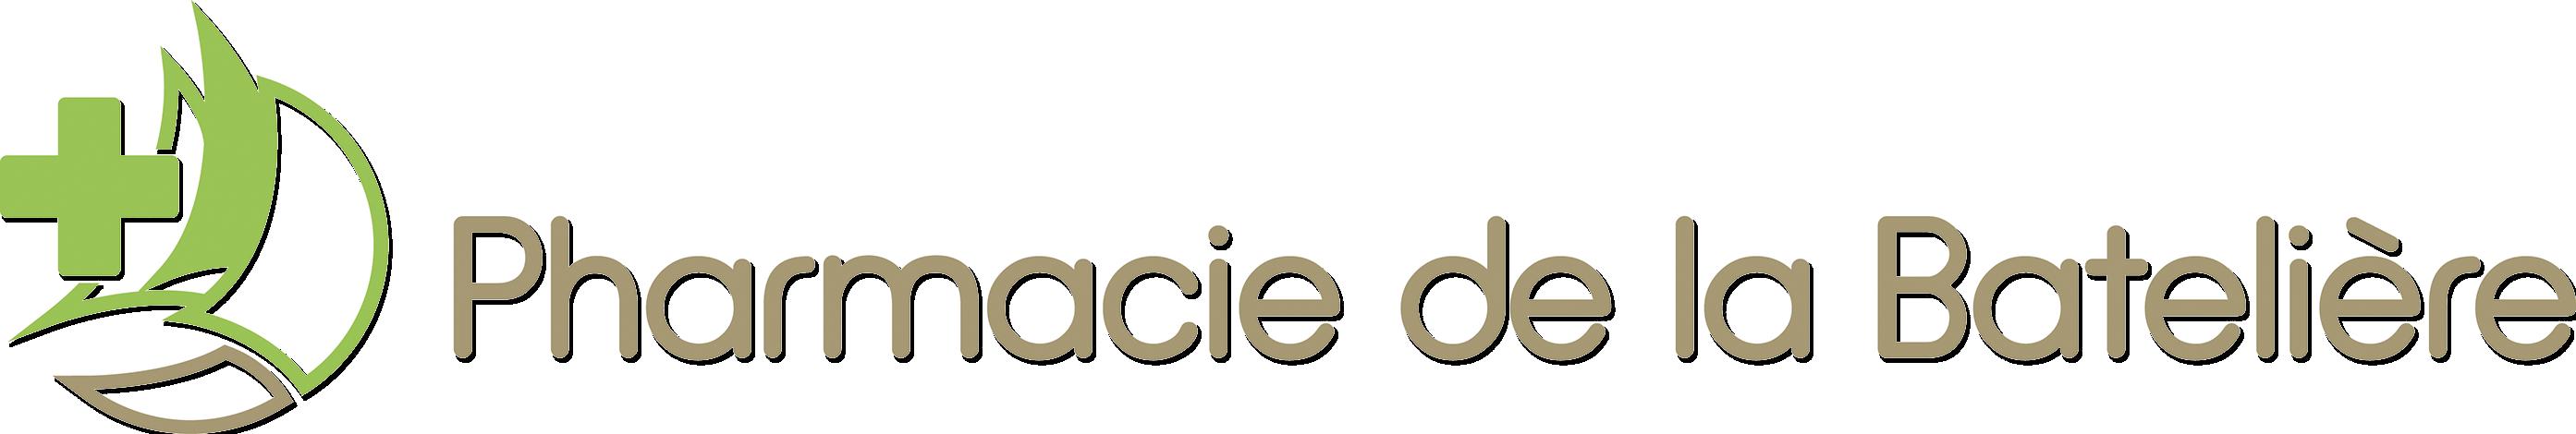 Pharmacie de la Batelière